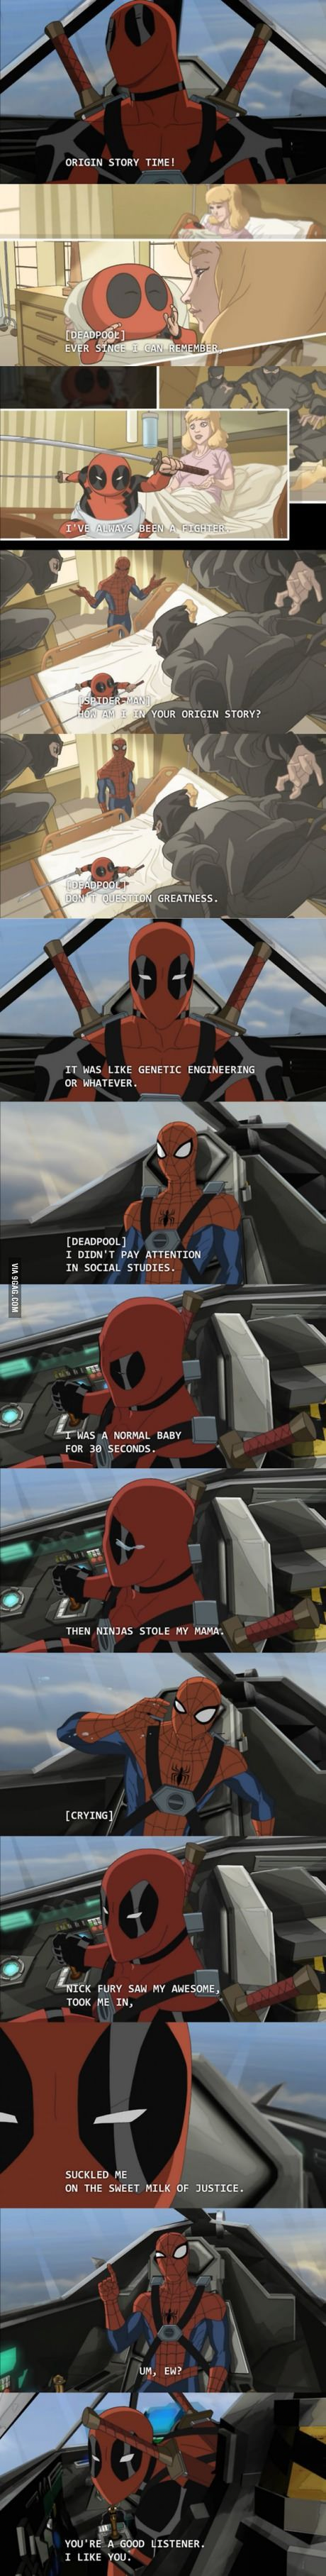 Origin Story Time! Spider-man & Deadpool